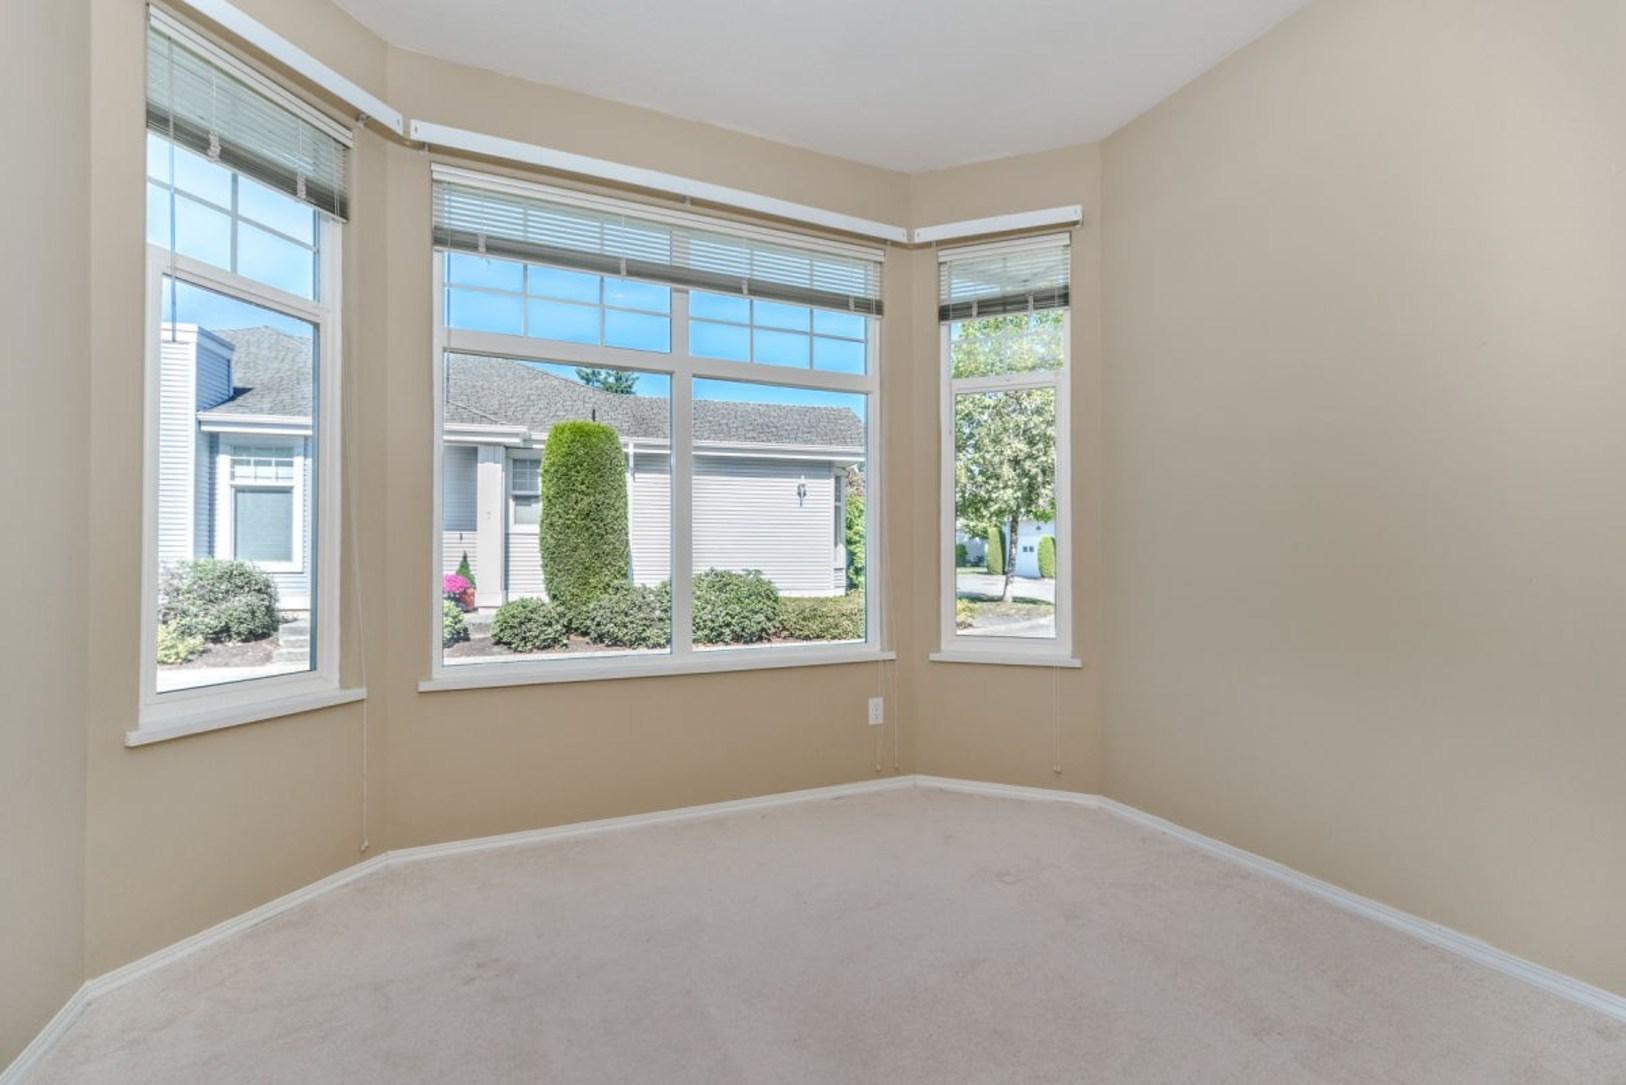 Bedroom at 19 - 20770 97b Avenue, Walnut Grove, Langley